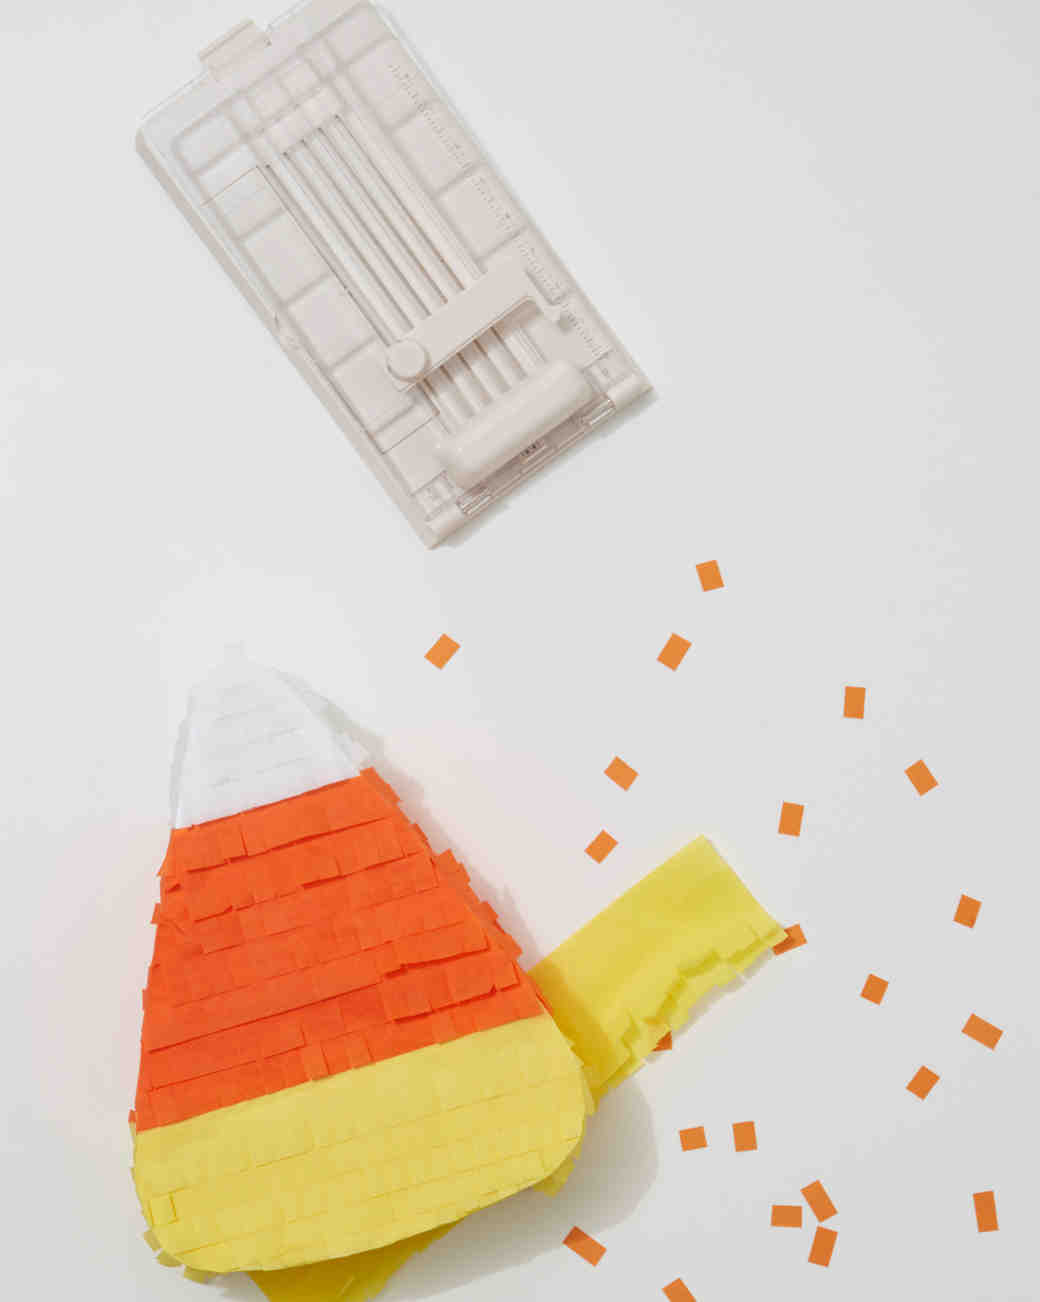 candy-corn-fringe-pinata-0058-d112614.jpg